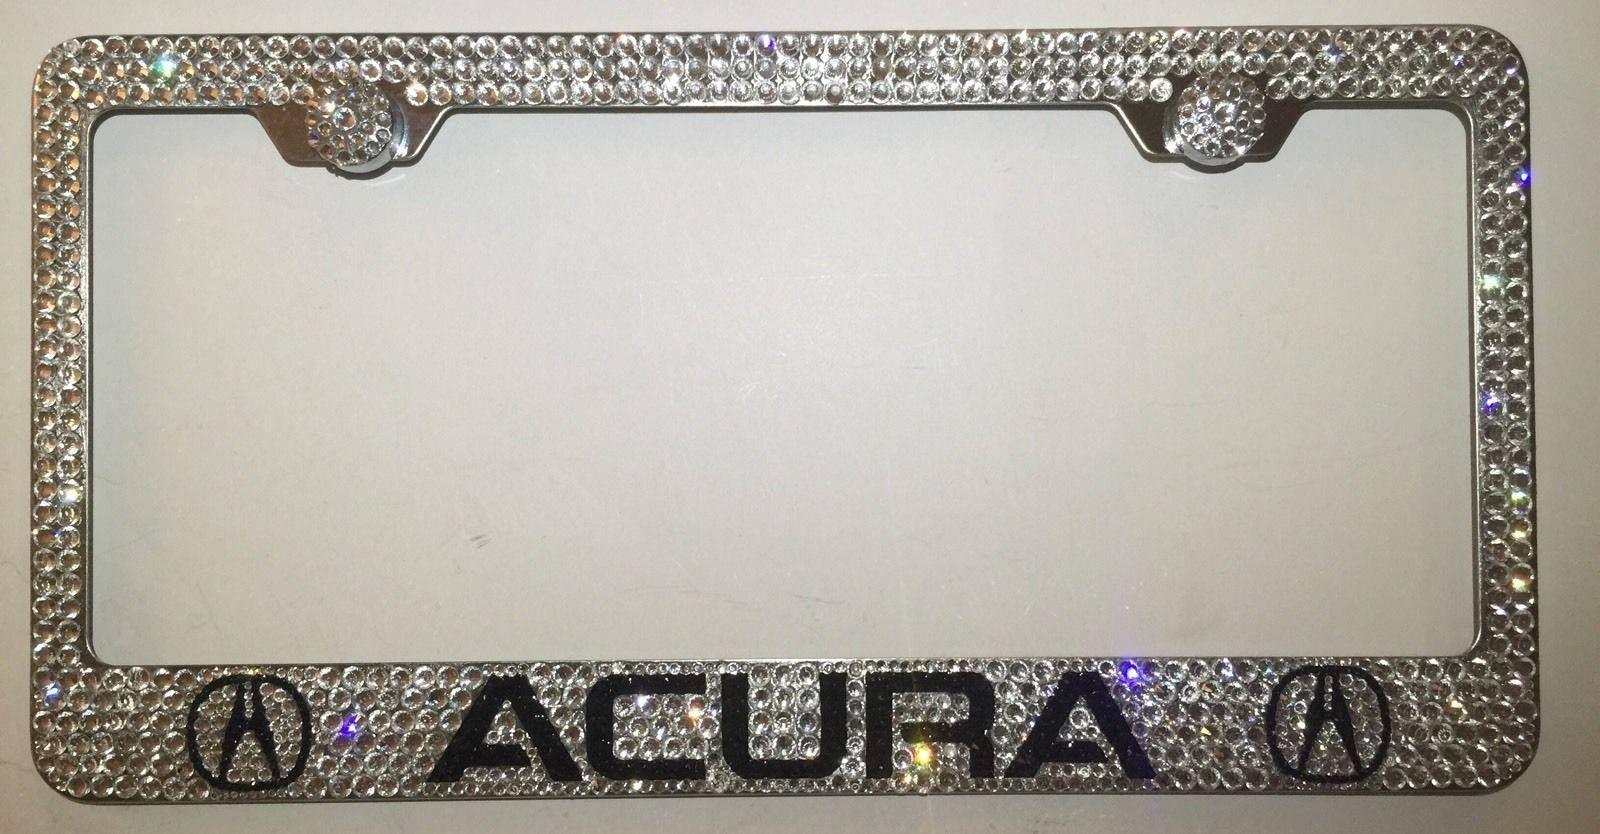 Acura W Logo Stainless Steel license plate frame W Swarovski ...